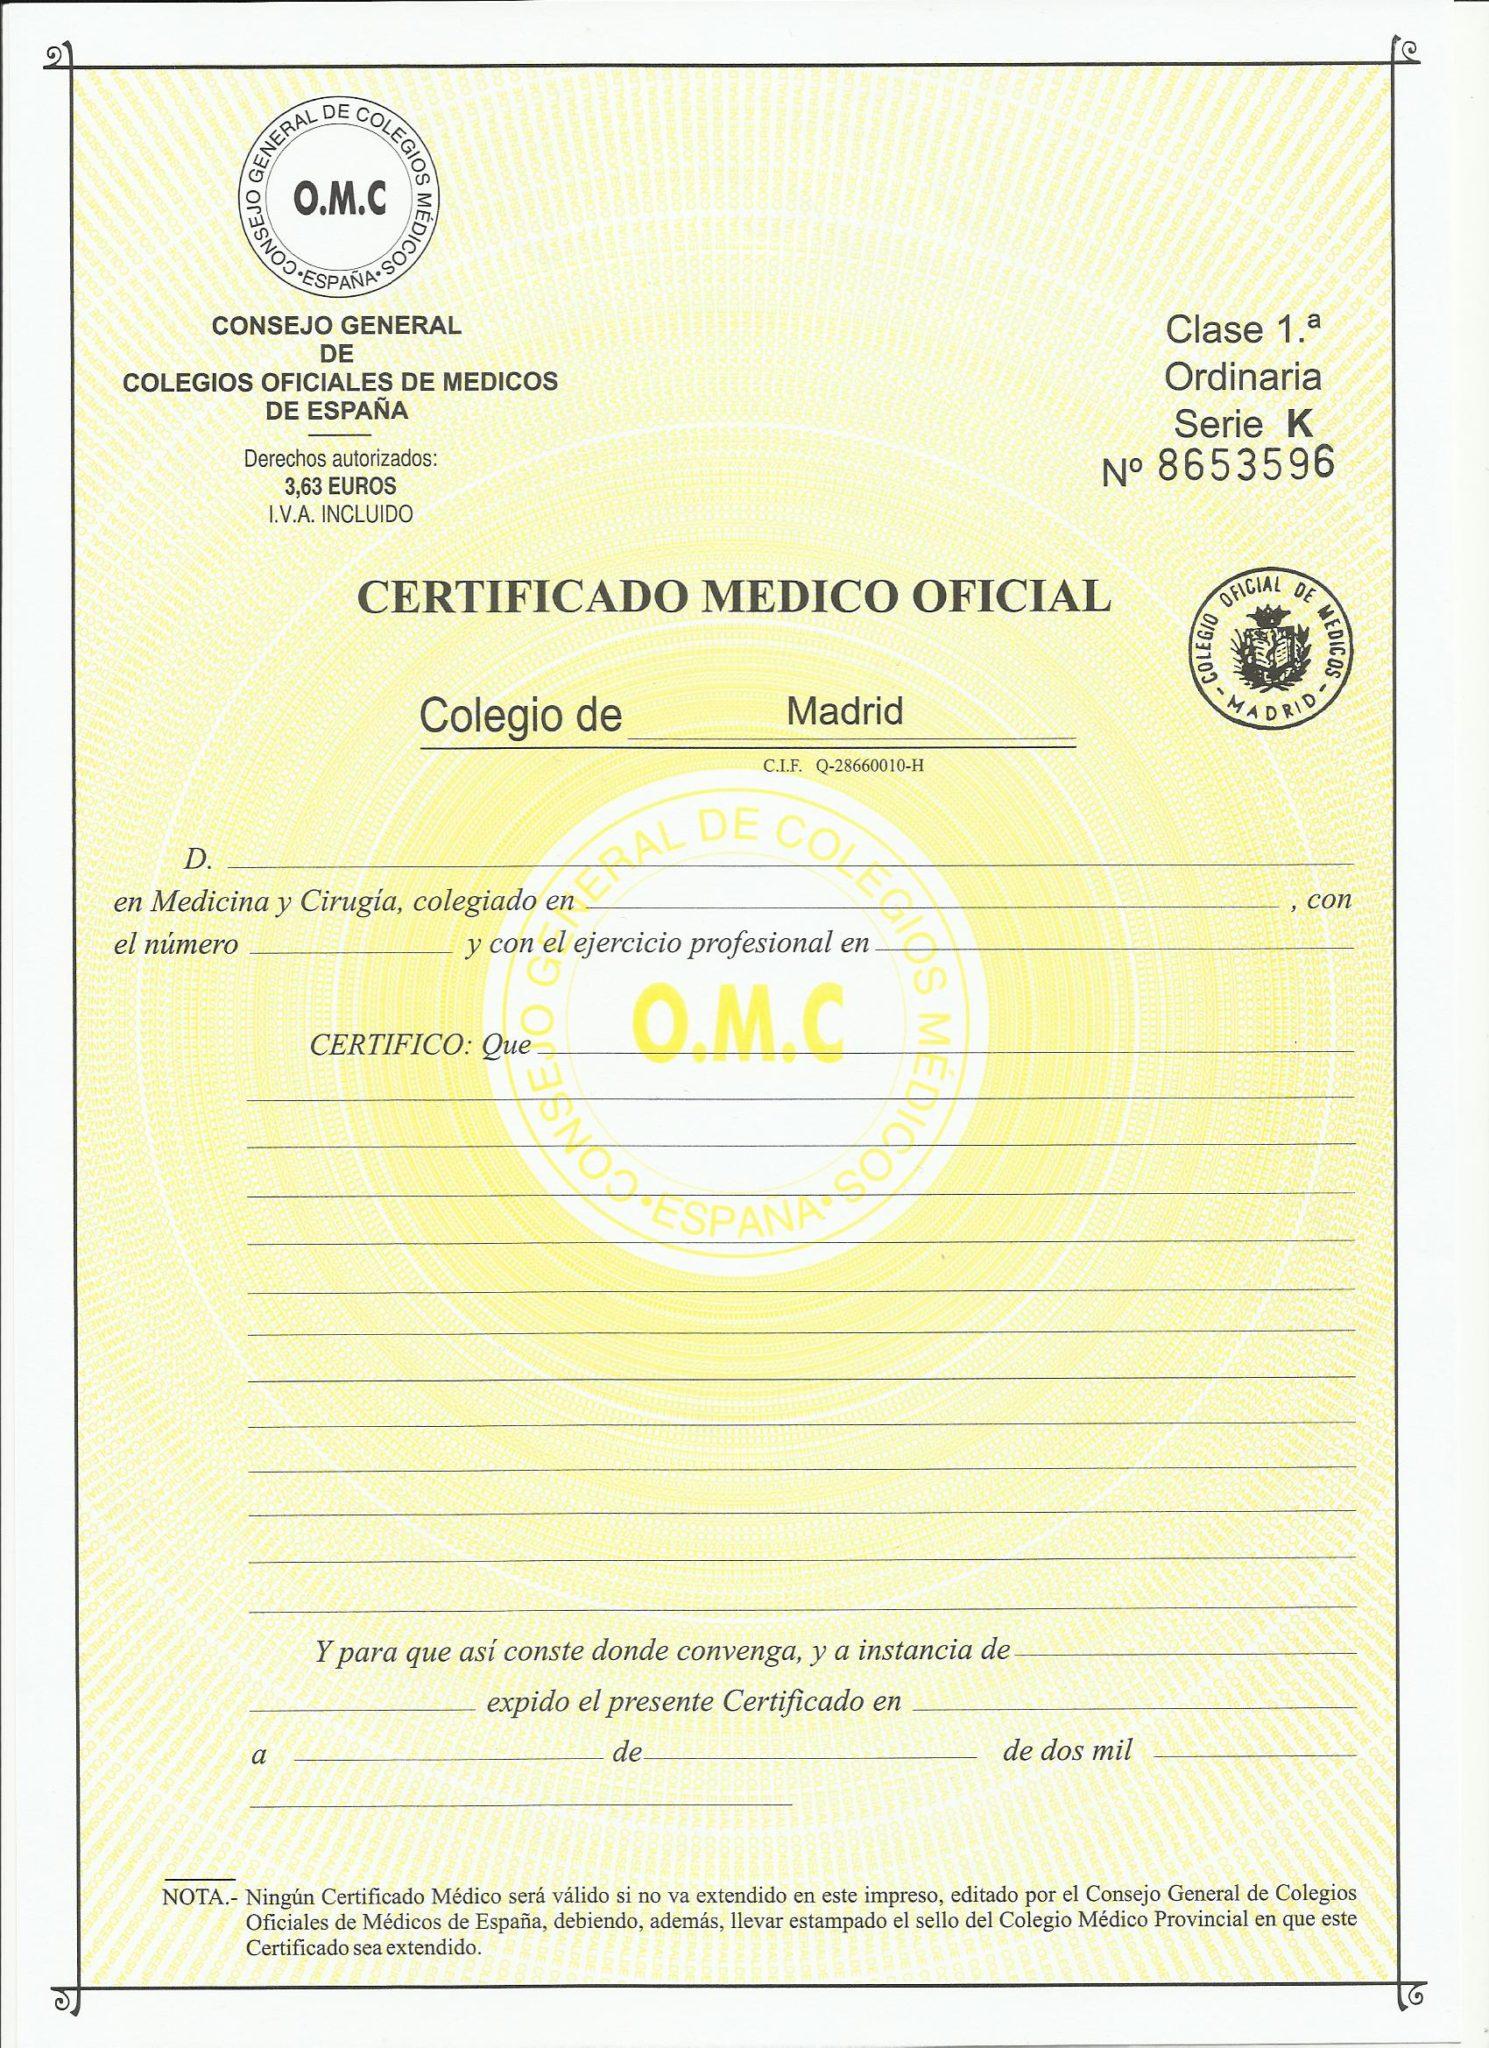 certificado m u00e9dico oficial   u00bfd u00f3nde adquirirlo   u00bfqui u00e9n lo